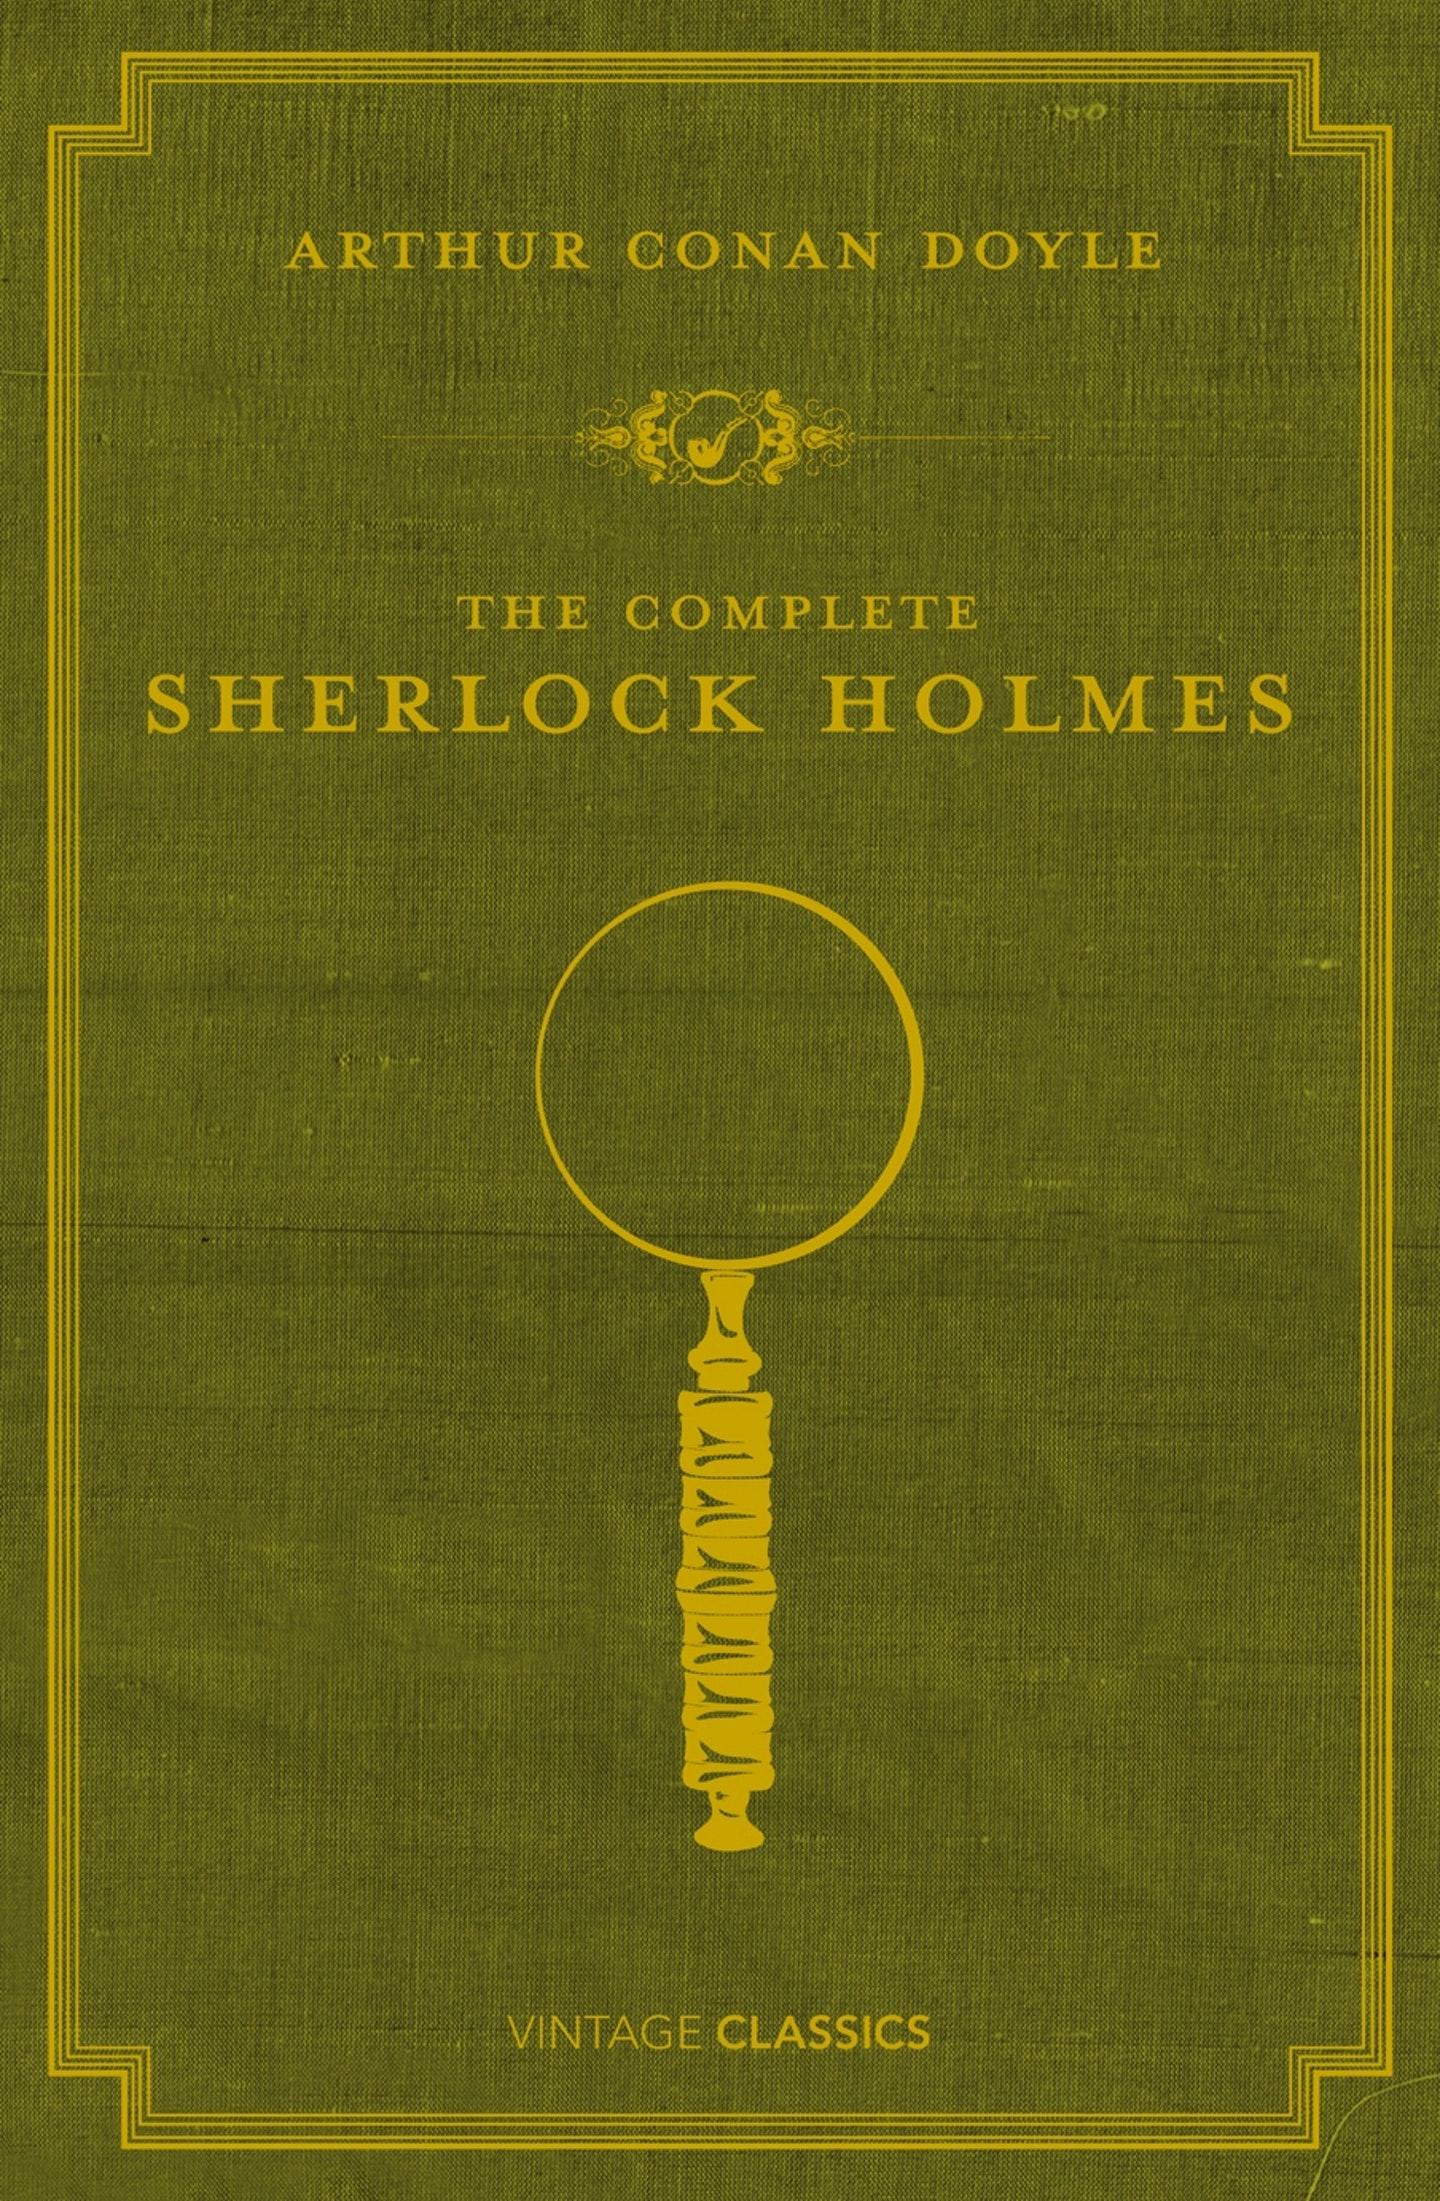 Penguin Book Cover Gifts ~ The complete sherlock holmes penguin books australia